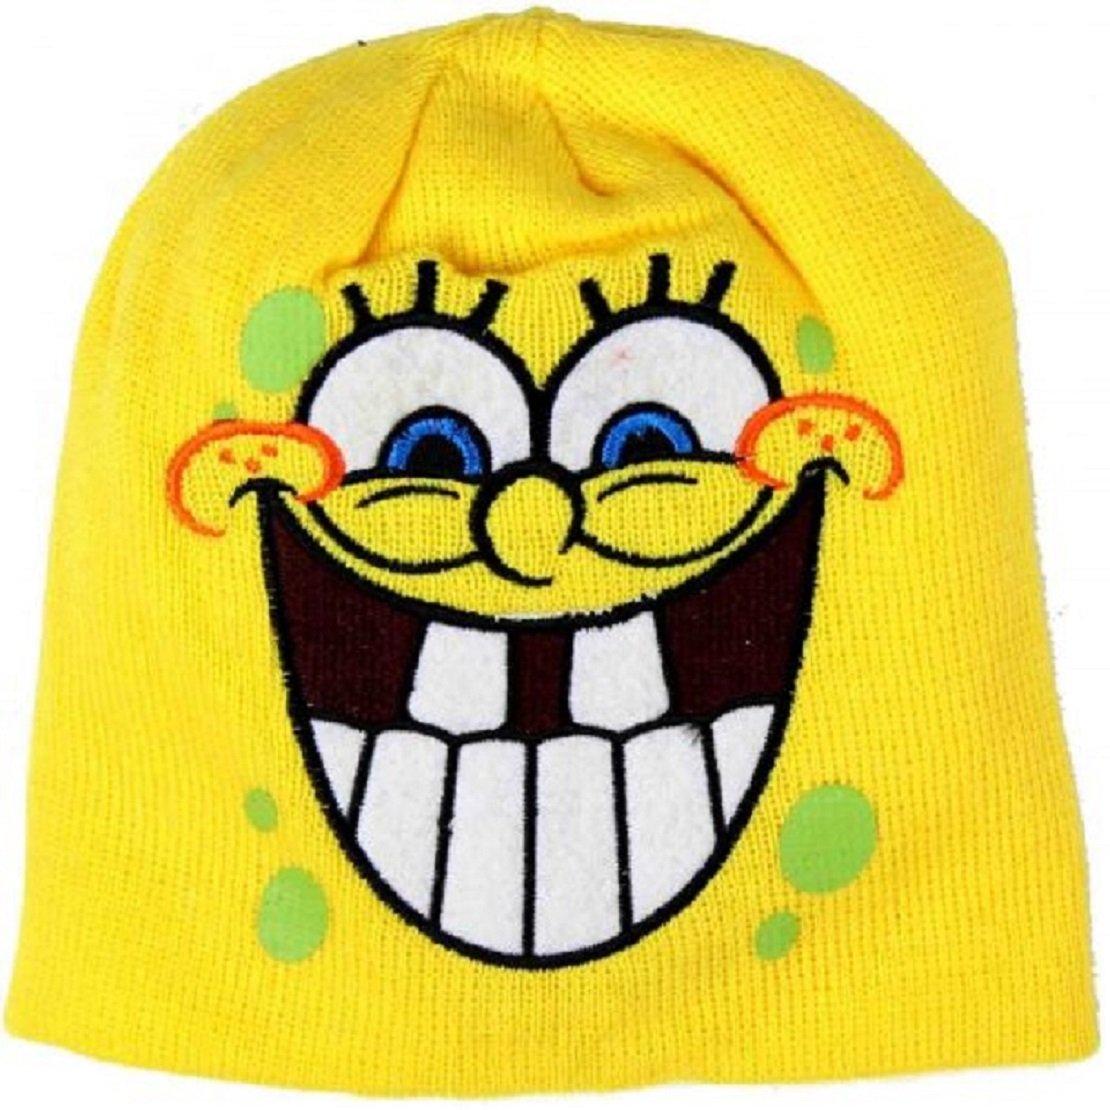 5a33d90c861e2 BOYS BEANIE HATS WINTER HAT SPONGEBOB SQUARE PANTS 2-8 YEARS SMILING (54cm  4-8 years)  Amazon.co.uk  Clothing